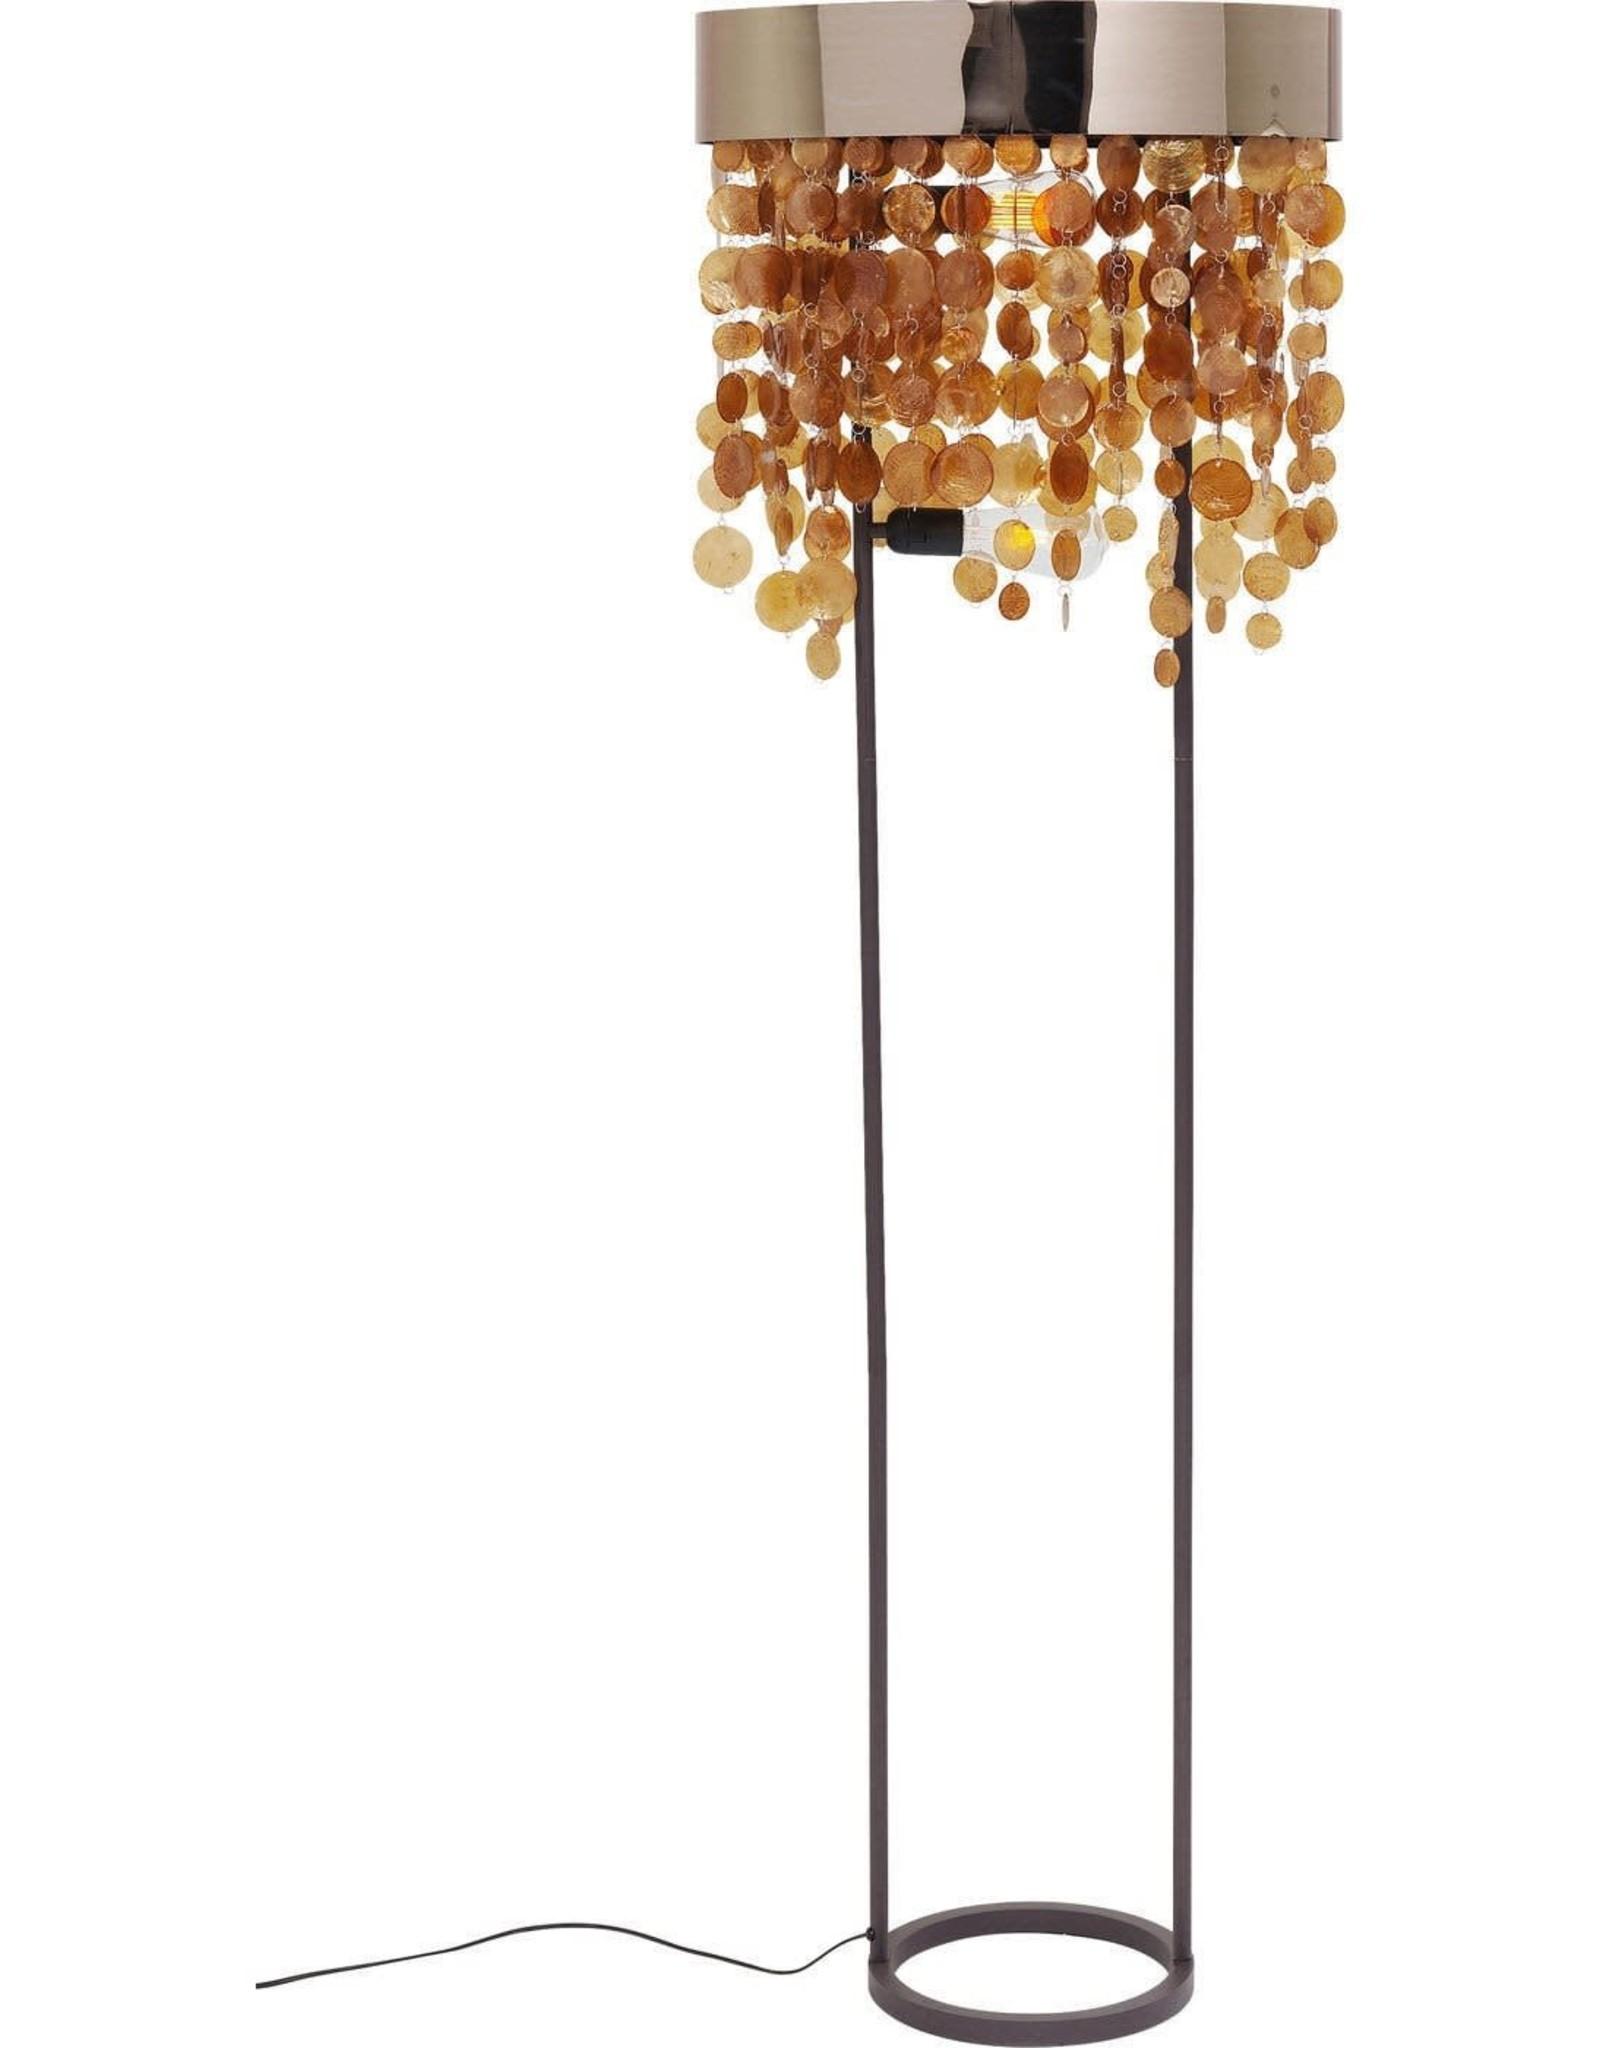 KARE DESIGN Floor Lamp Le Ballroom